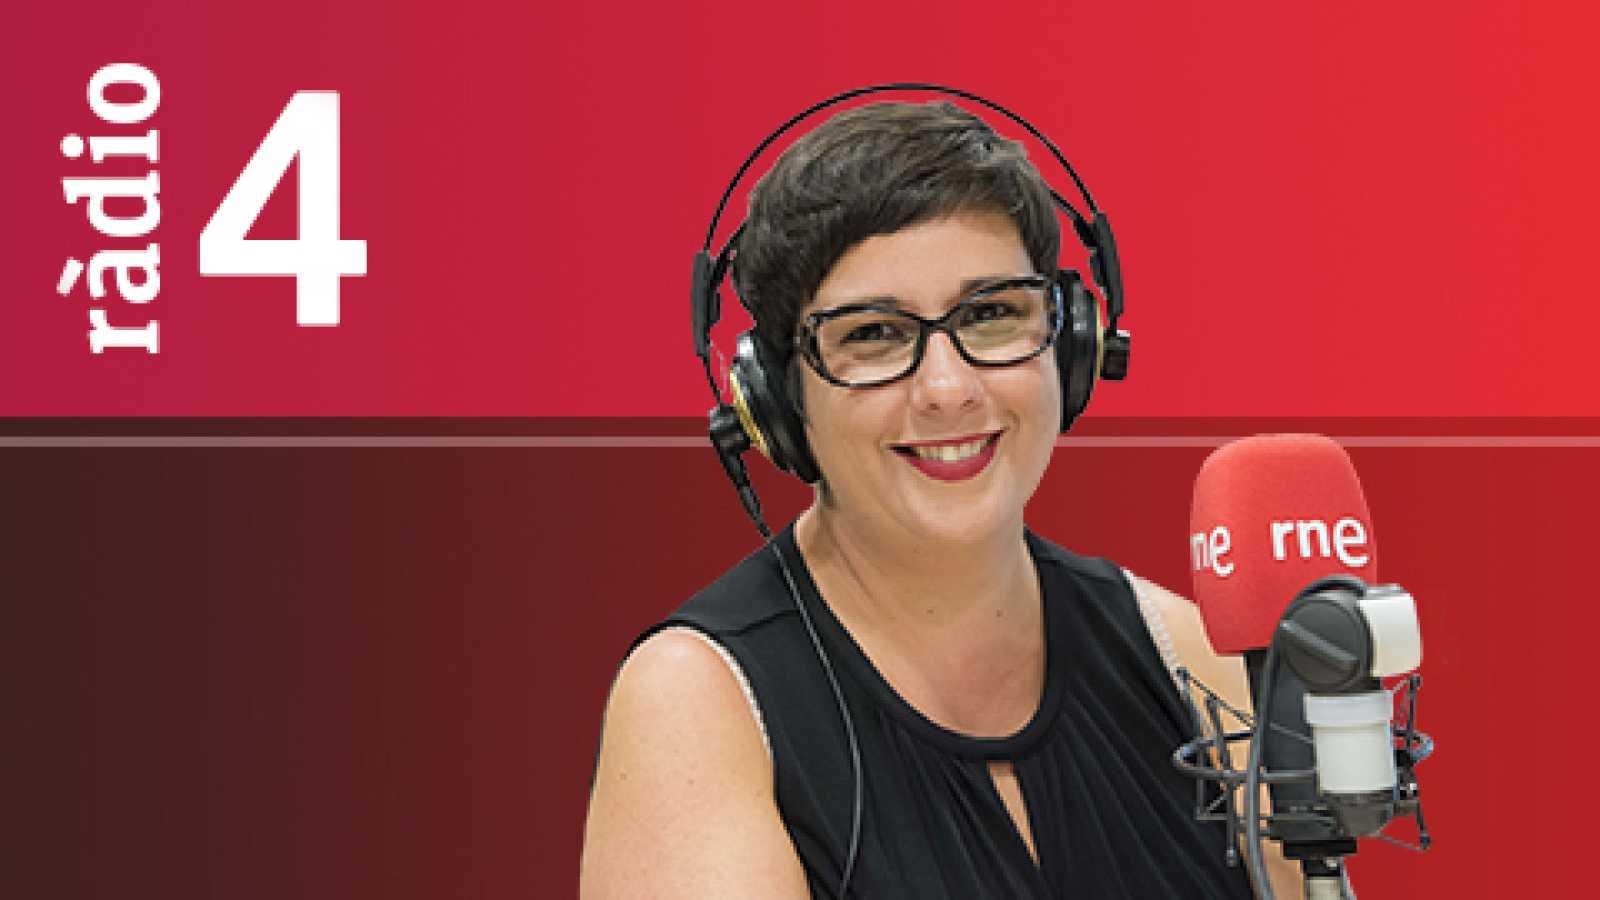 Realpolitik - Francesc Ten, Mar Ampurdanés, Marilén Barceló